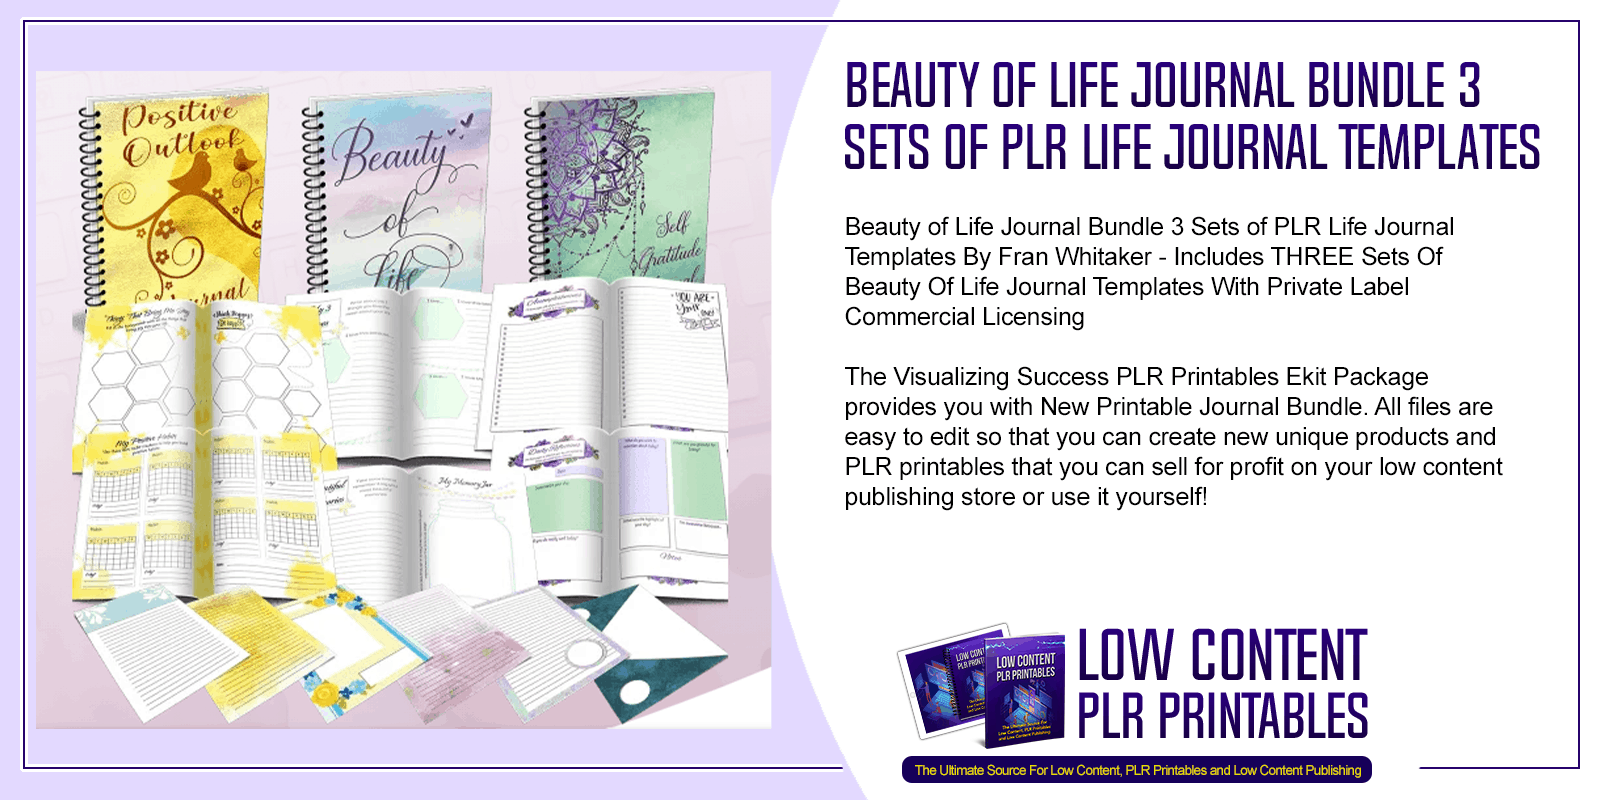 Beauty of Life Journal Bundle 3 Sets of PLR Life Journal Templates